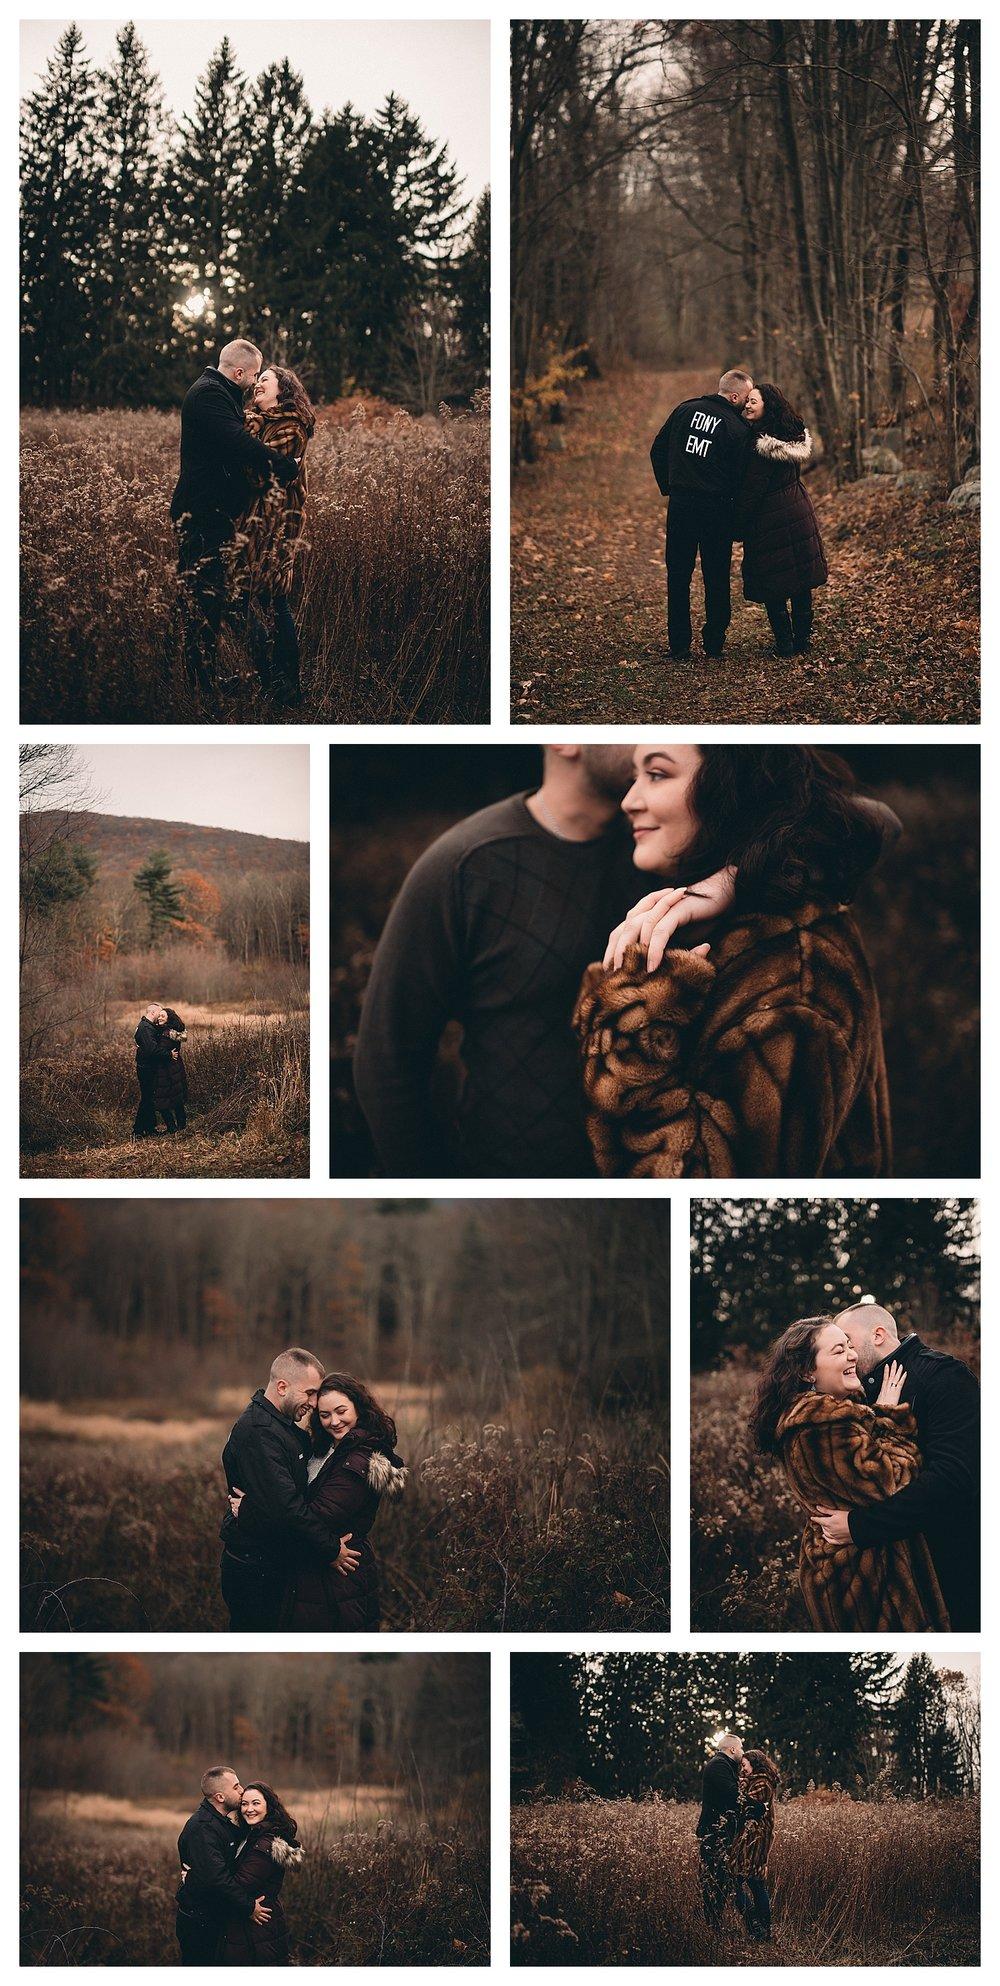 NEPA-Scranton-wedding-engagement-photographer-in-Philadelphia-PA-Central-PA_0311.jpg